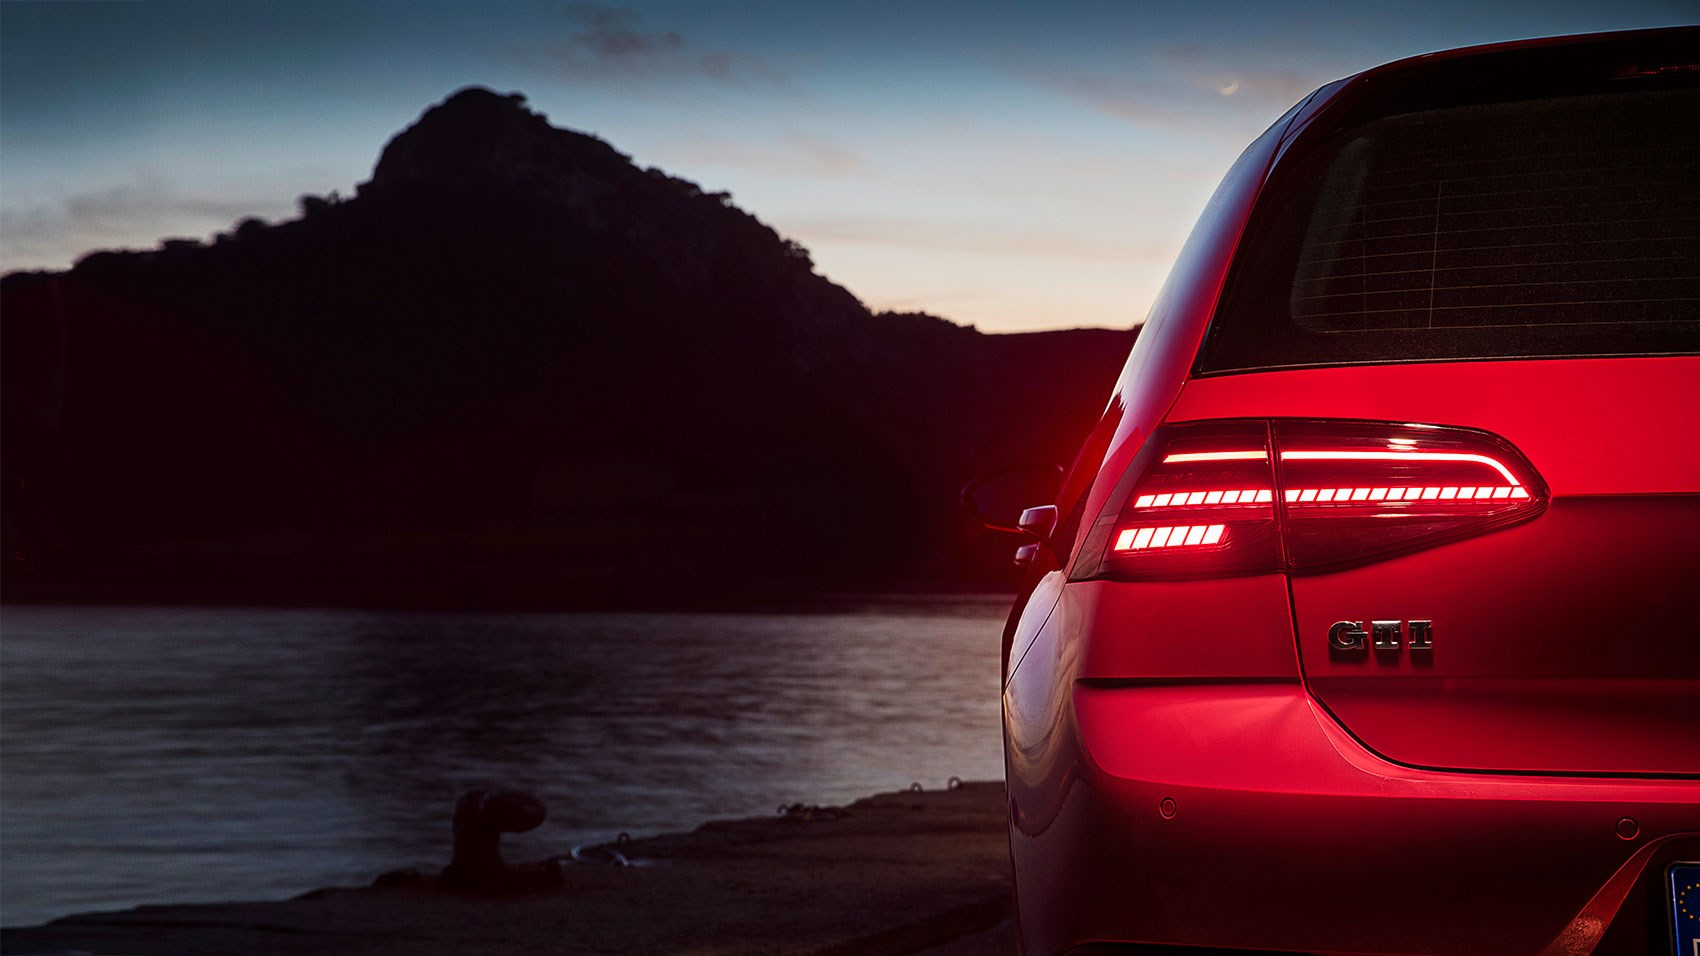 0 Down Lease Deals >> VW Golf GTI 2017 Mk7 facelift review | CAR Magazine